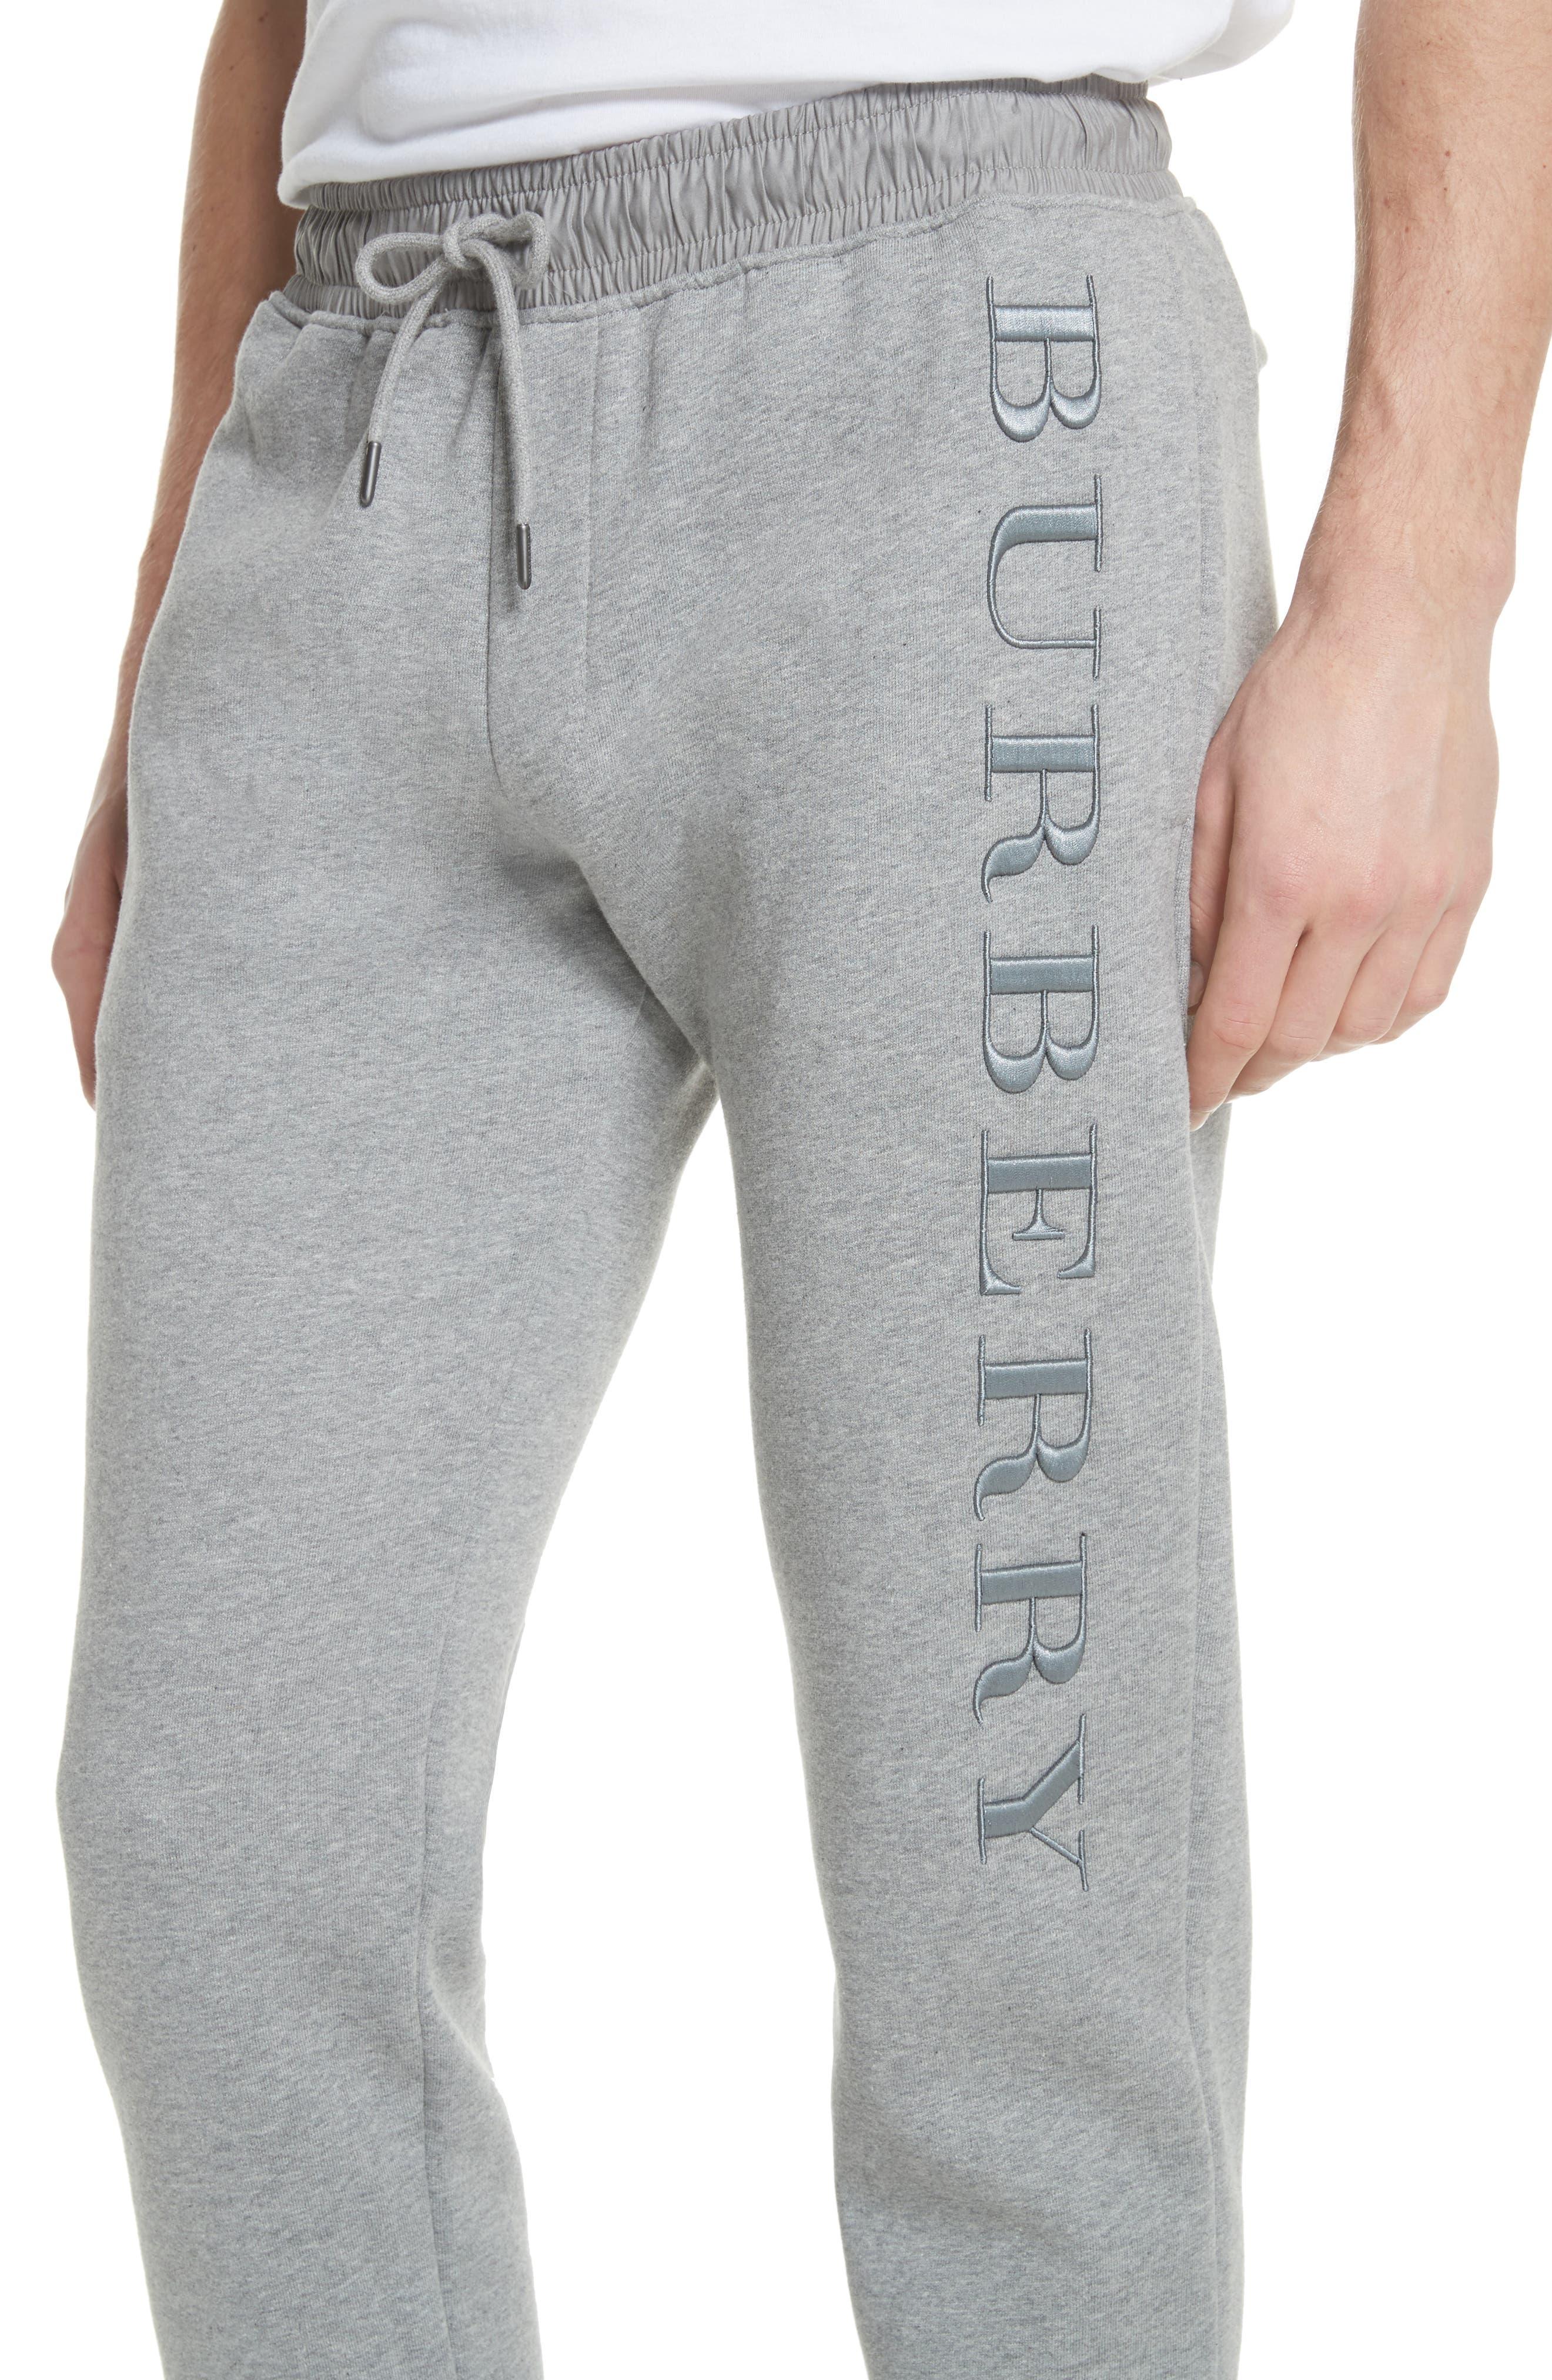 Nickford Lounge Pants,                             Alternate thumbnail 4, color,                             Pale Grey Melange